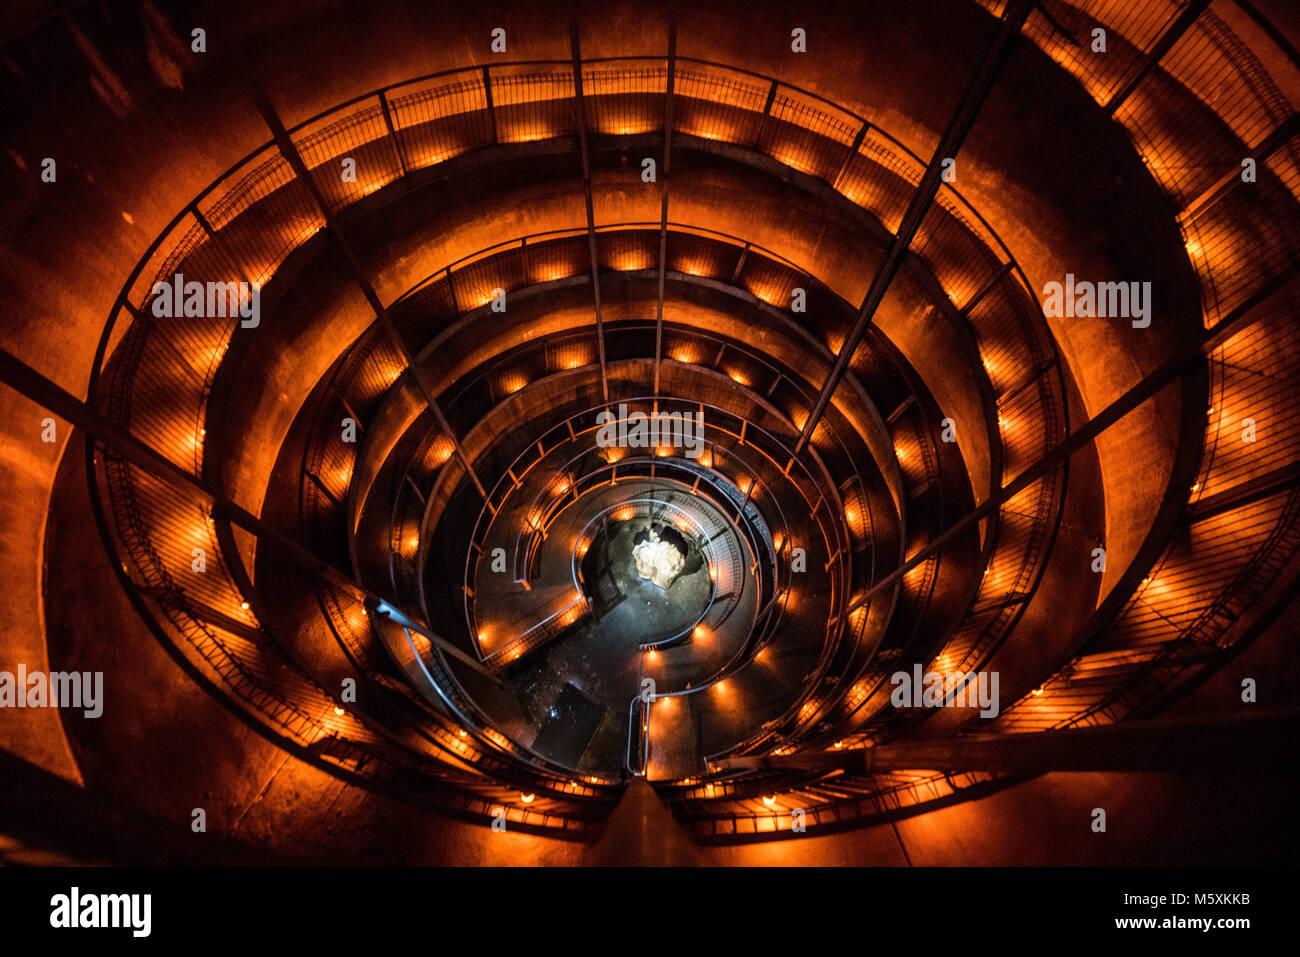 Ruakari Spiral Staircases - Stock Image